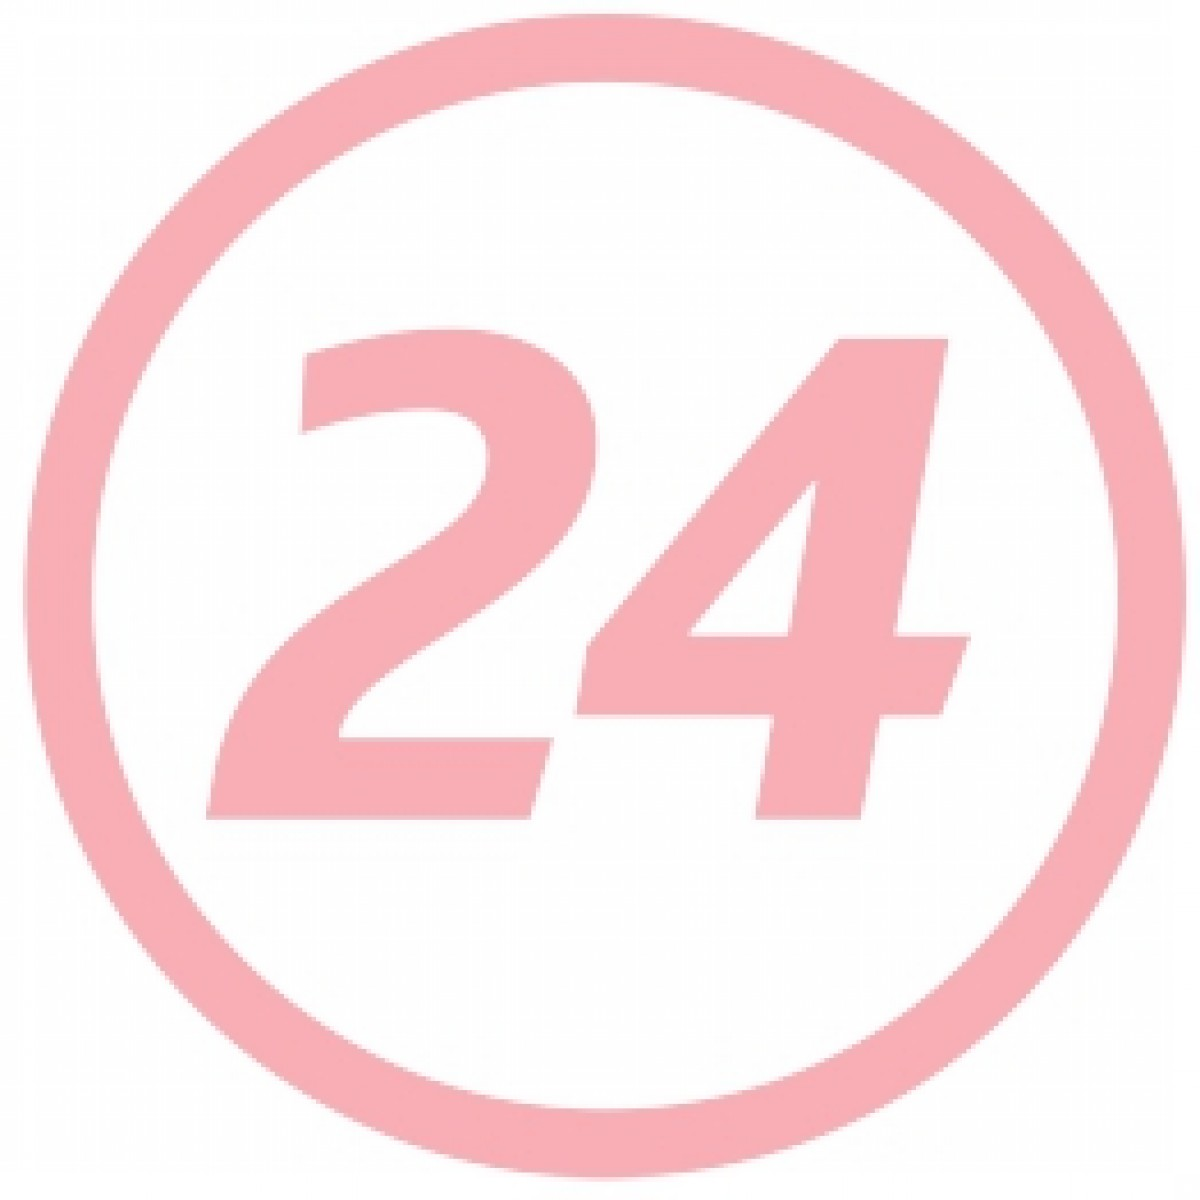 VICHY Tratament Roll On Anti-Transpirant Cu Parfum 48h Transpiratie Intensa, Roll On, 50ml